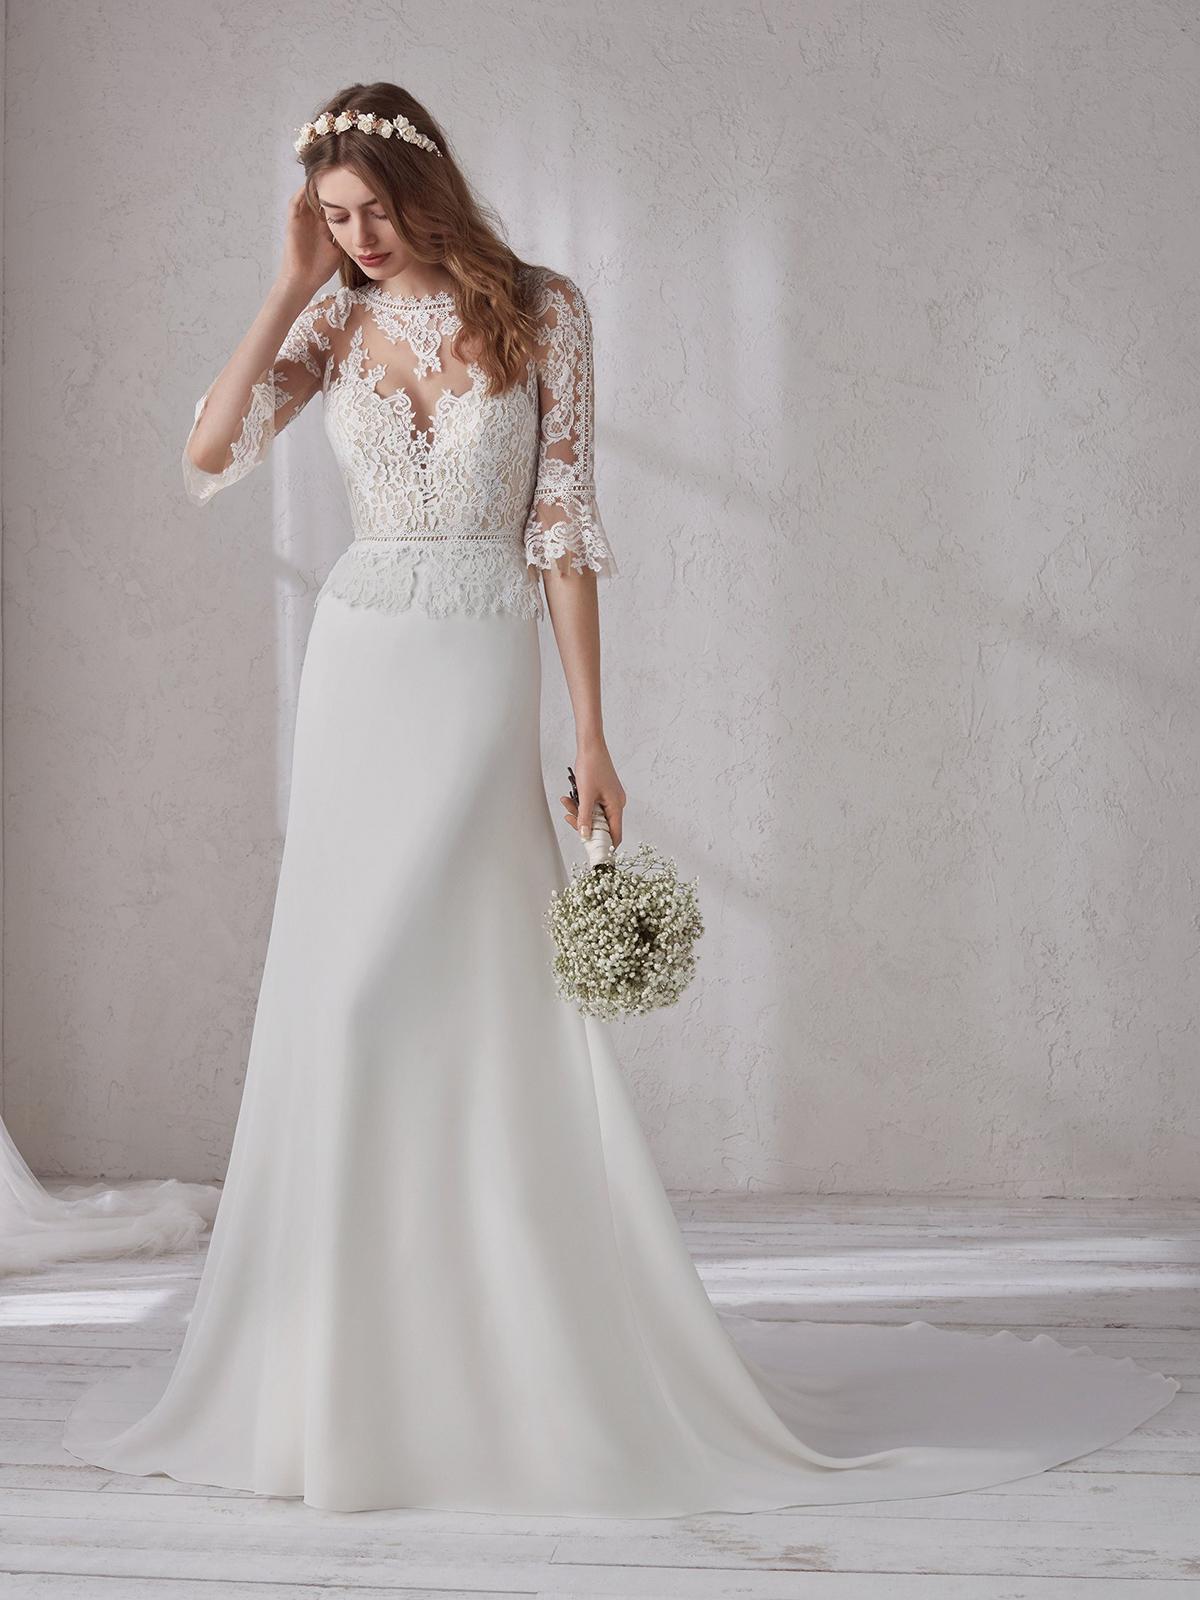 a29a6b5727 Parvani Vida Bridal and Formal - Wedding Dresses - Weddings in Houston